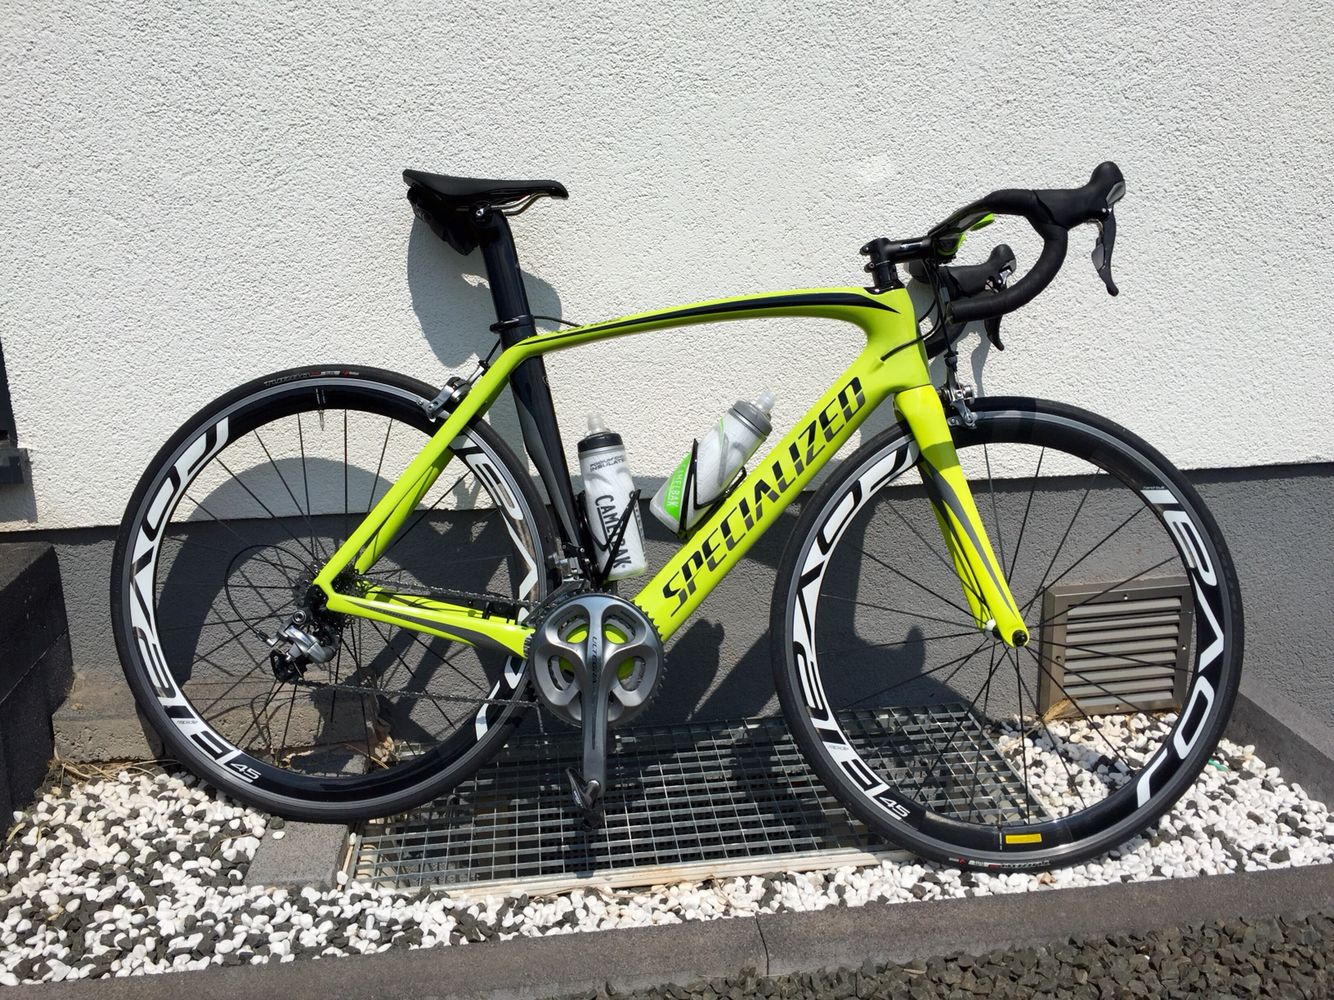 Specialized Venge Pro 2015 Classic Road Bike Bicycle Race Pretty Bike